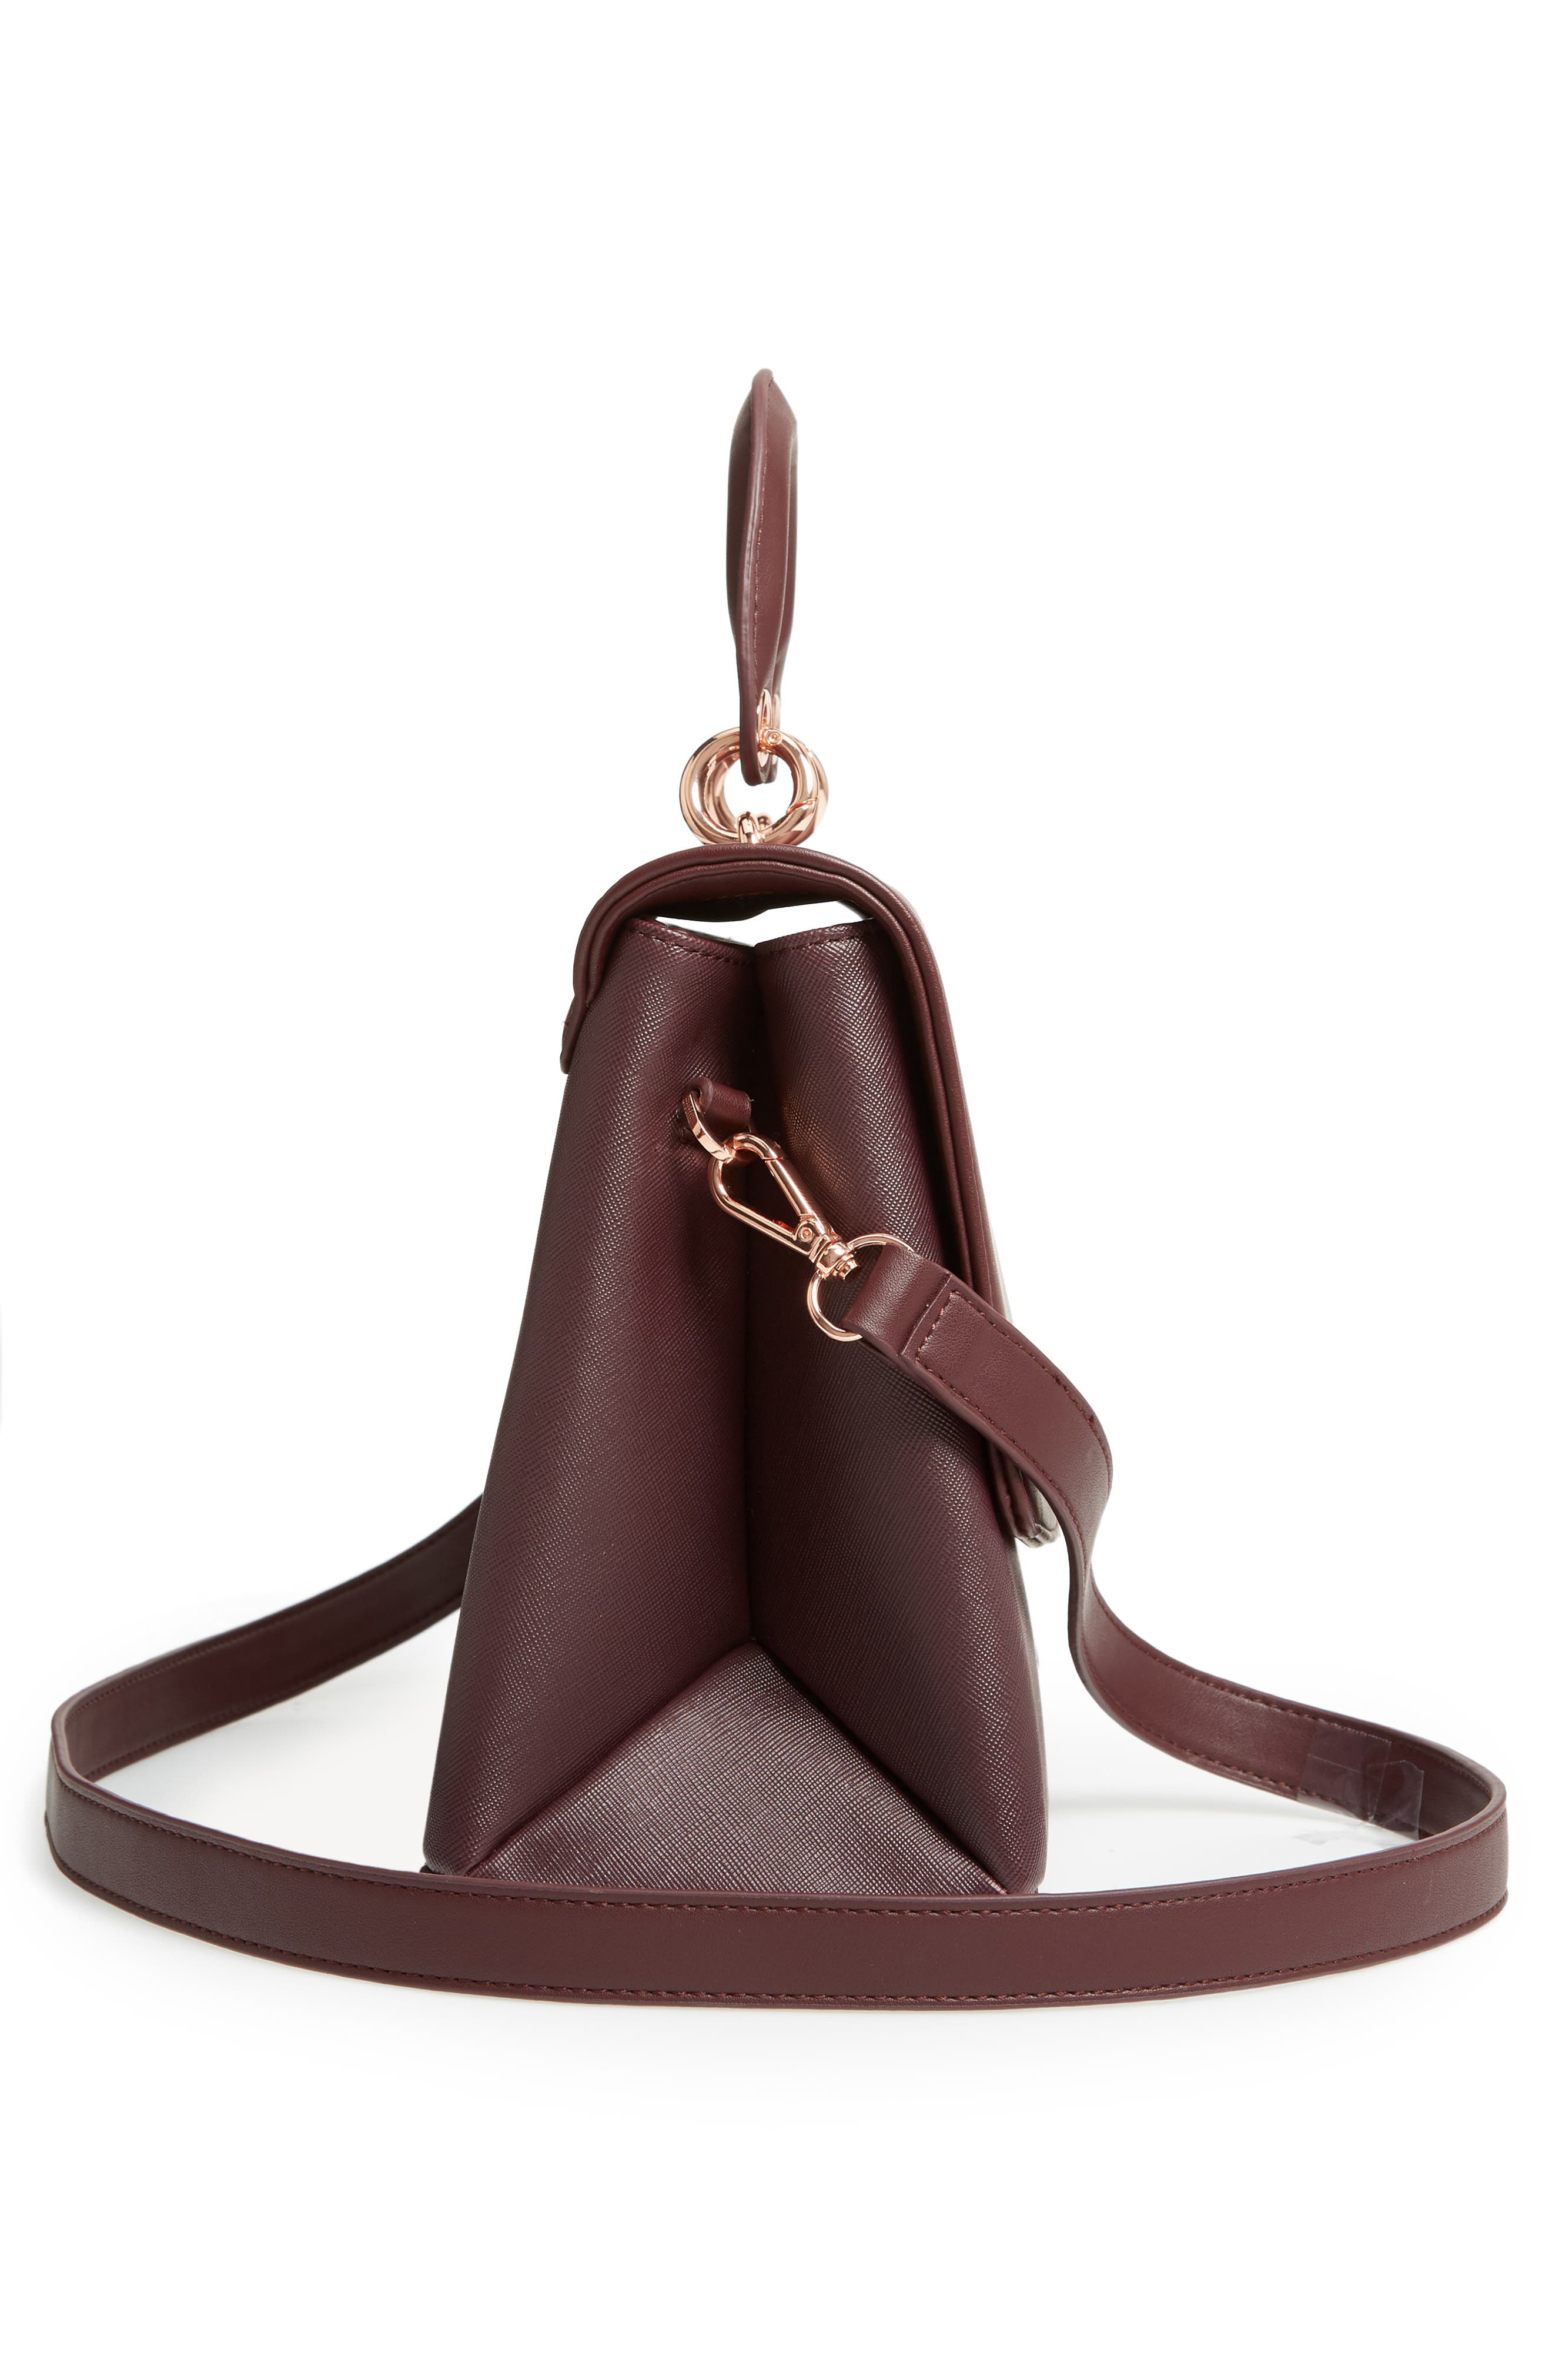 Keiira Lady Bag Faux Leather Top Handle Satchel,                             Alternate thumbnail 5, color,                             DEEP PURPLE